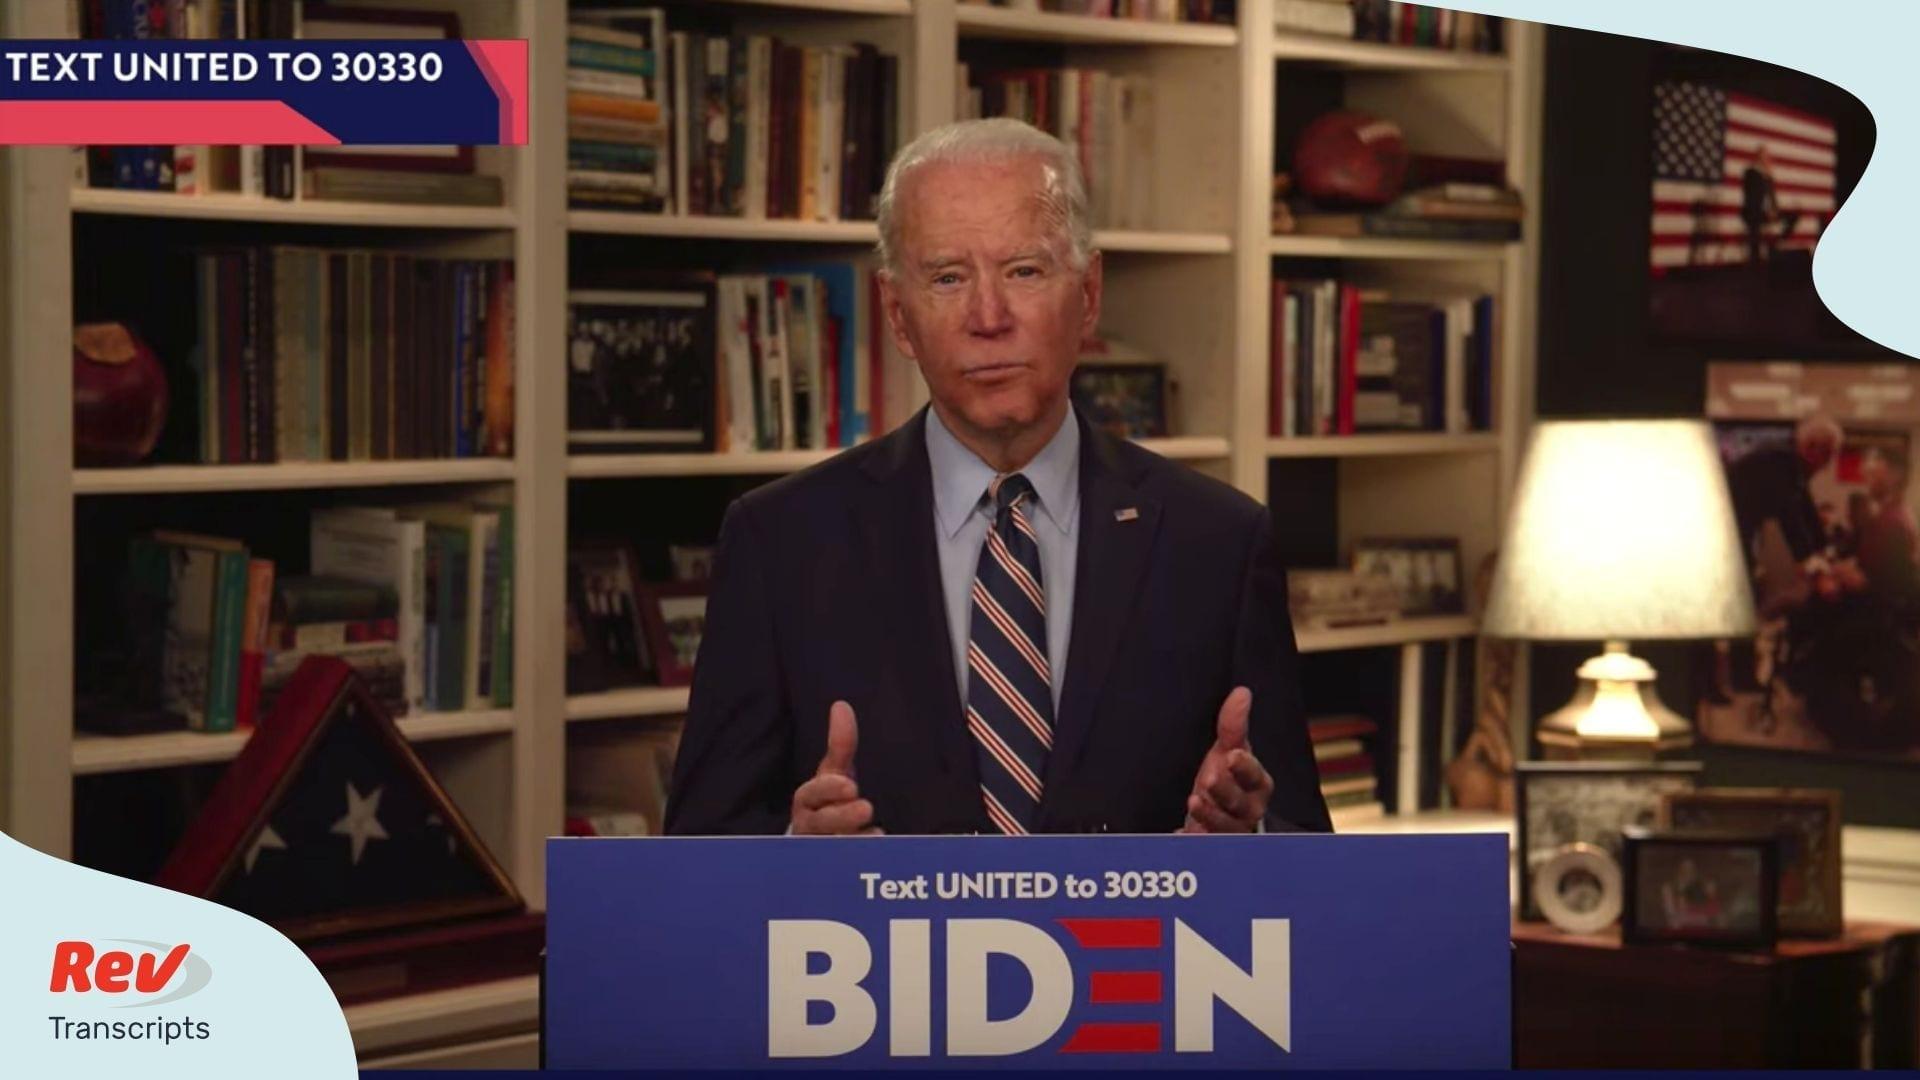 Joe Biden YouTube Speech Transcript March 23 Coronavirus